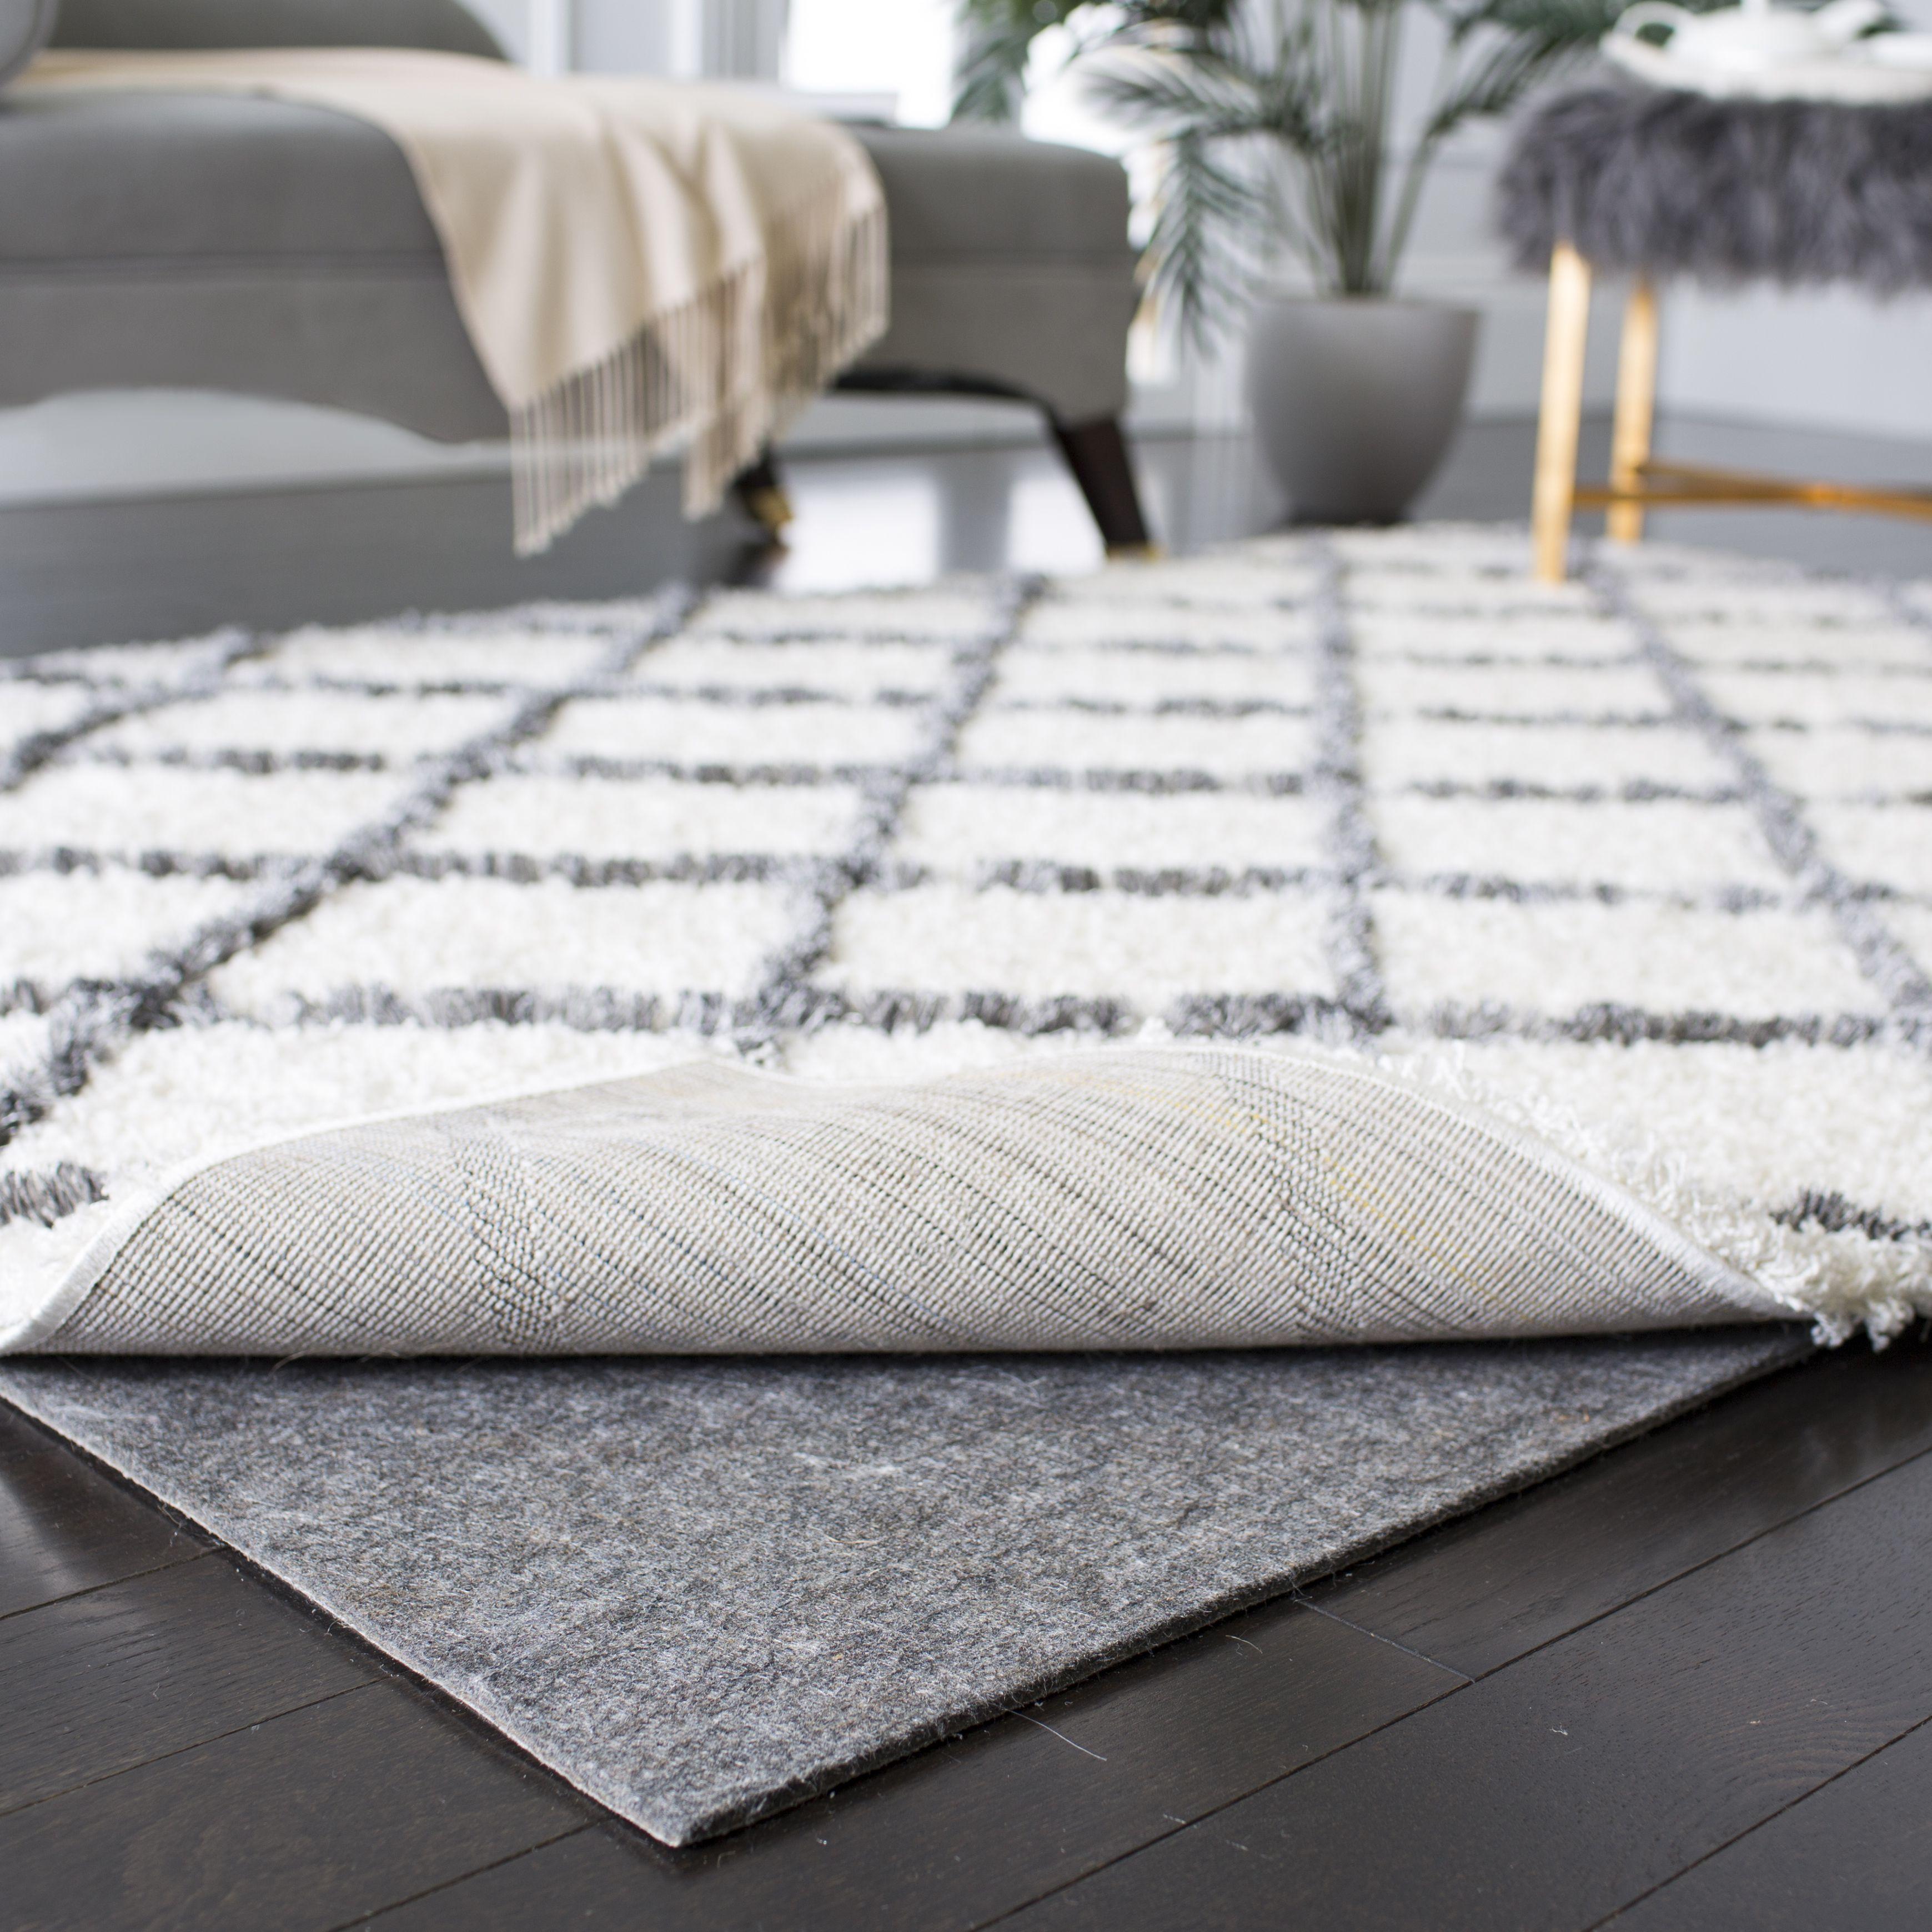 Safavieh Premium Dura Rug Pad For Hard Floor And Carpet Walmart Com Rugs On Carpet Rug Pad Solid Rugs